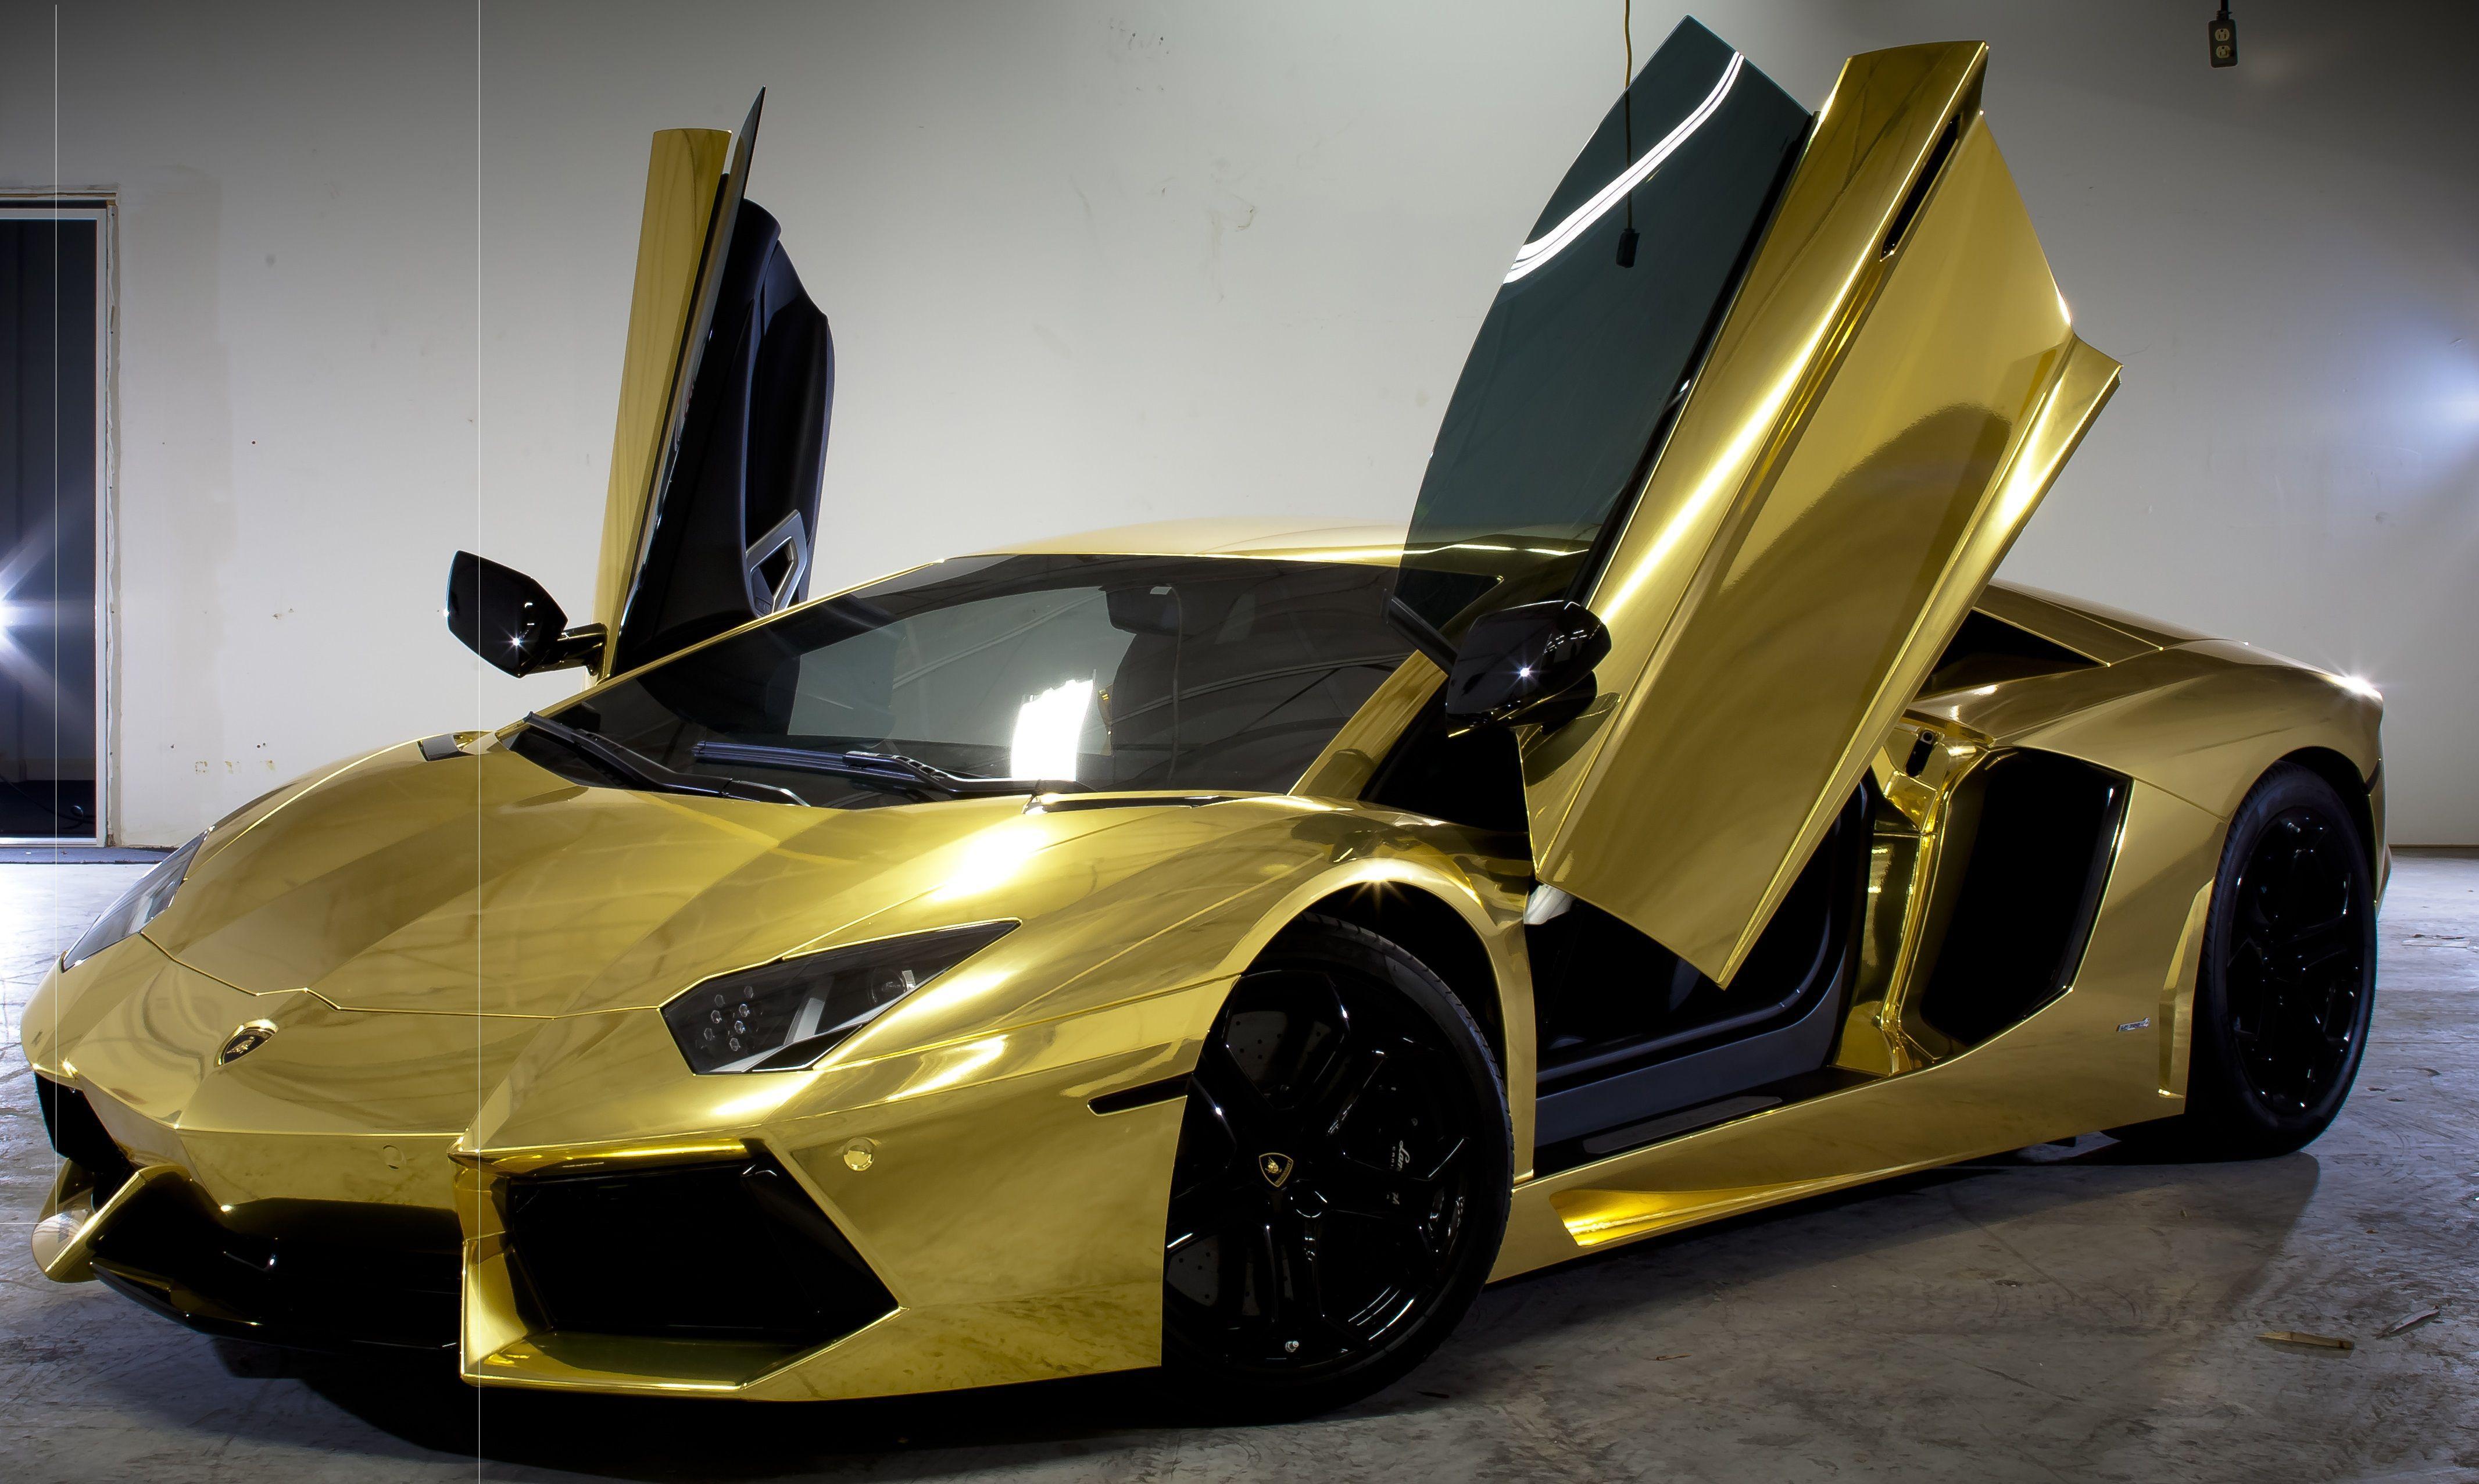 Gold Lamborghini Wallpapers Top Free Gold Lamborghini